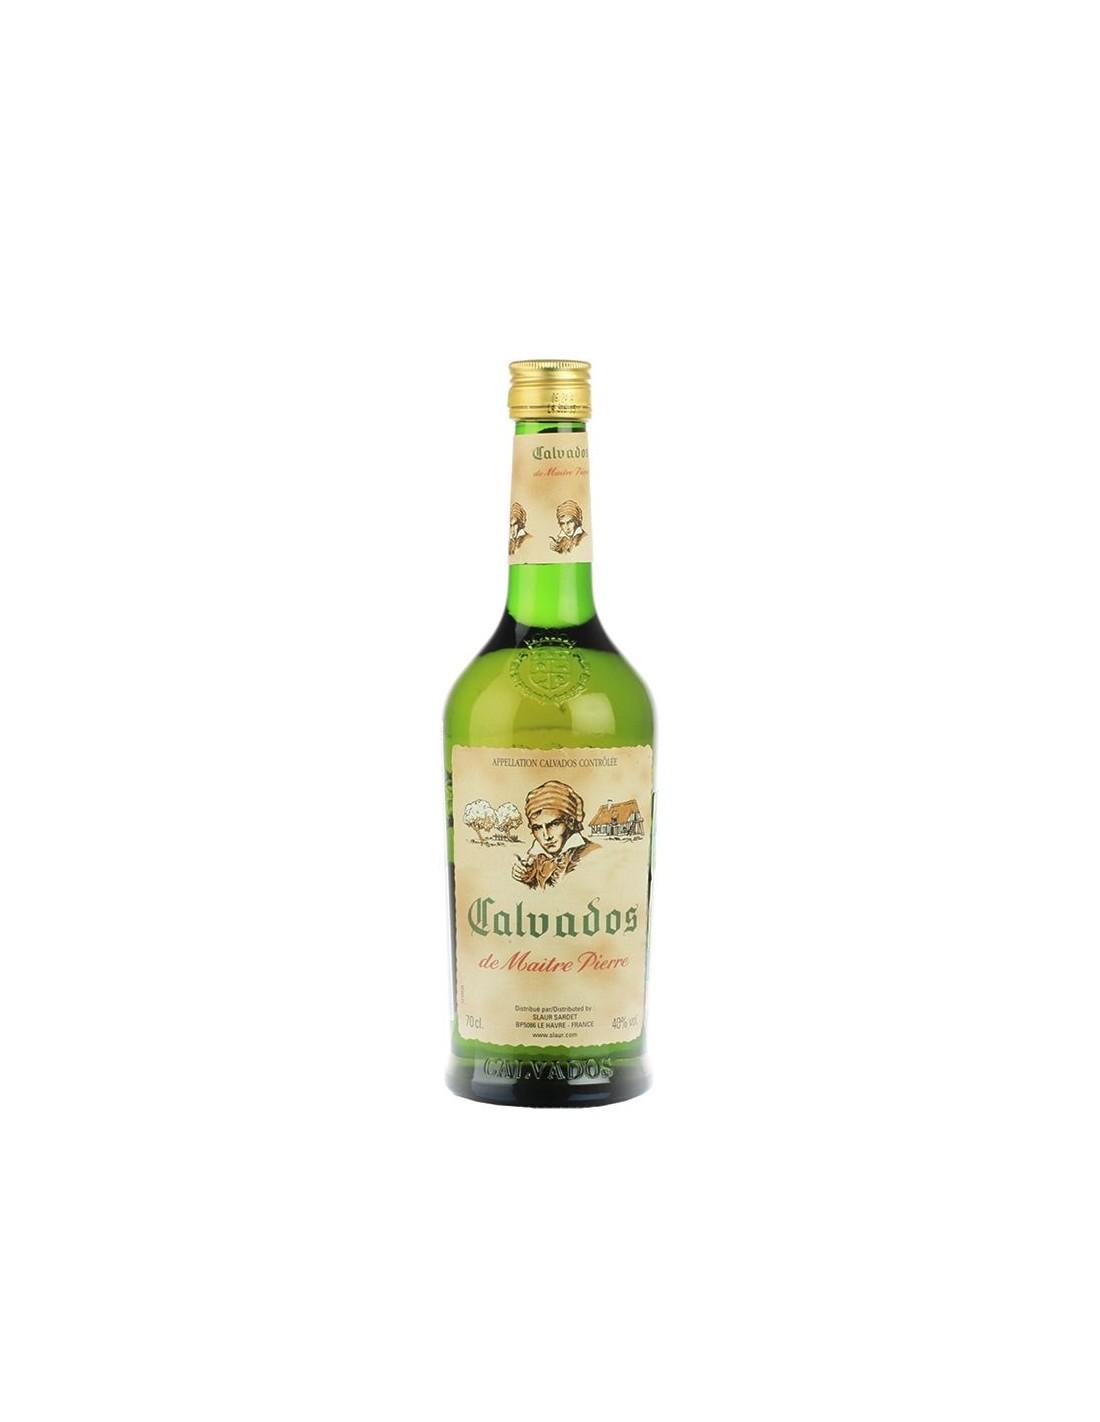 Brandy Calvados de Maitre Pierre 40% alc., 0.7L, Franta